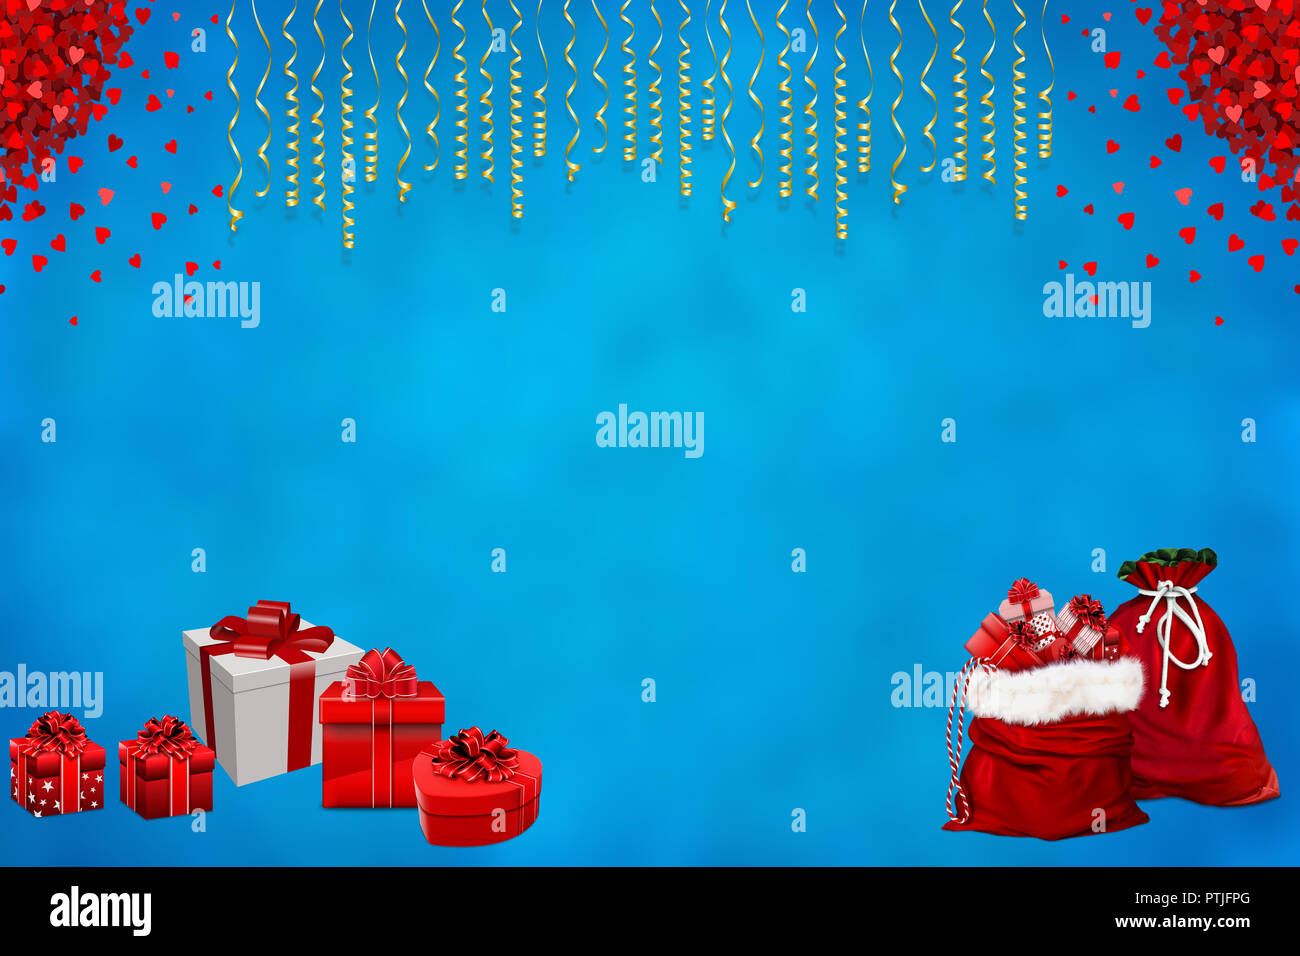 christmas and new year celebration background